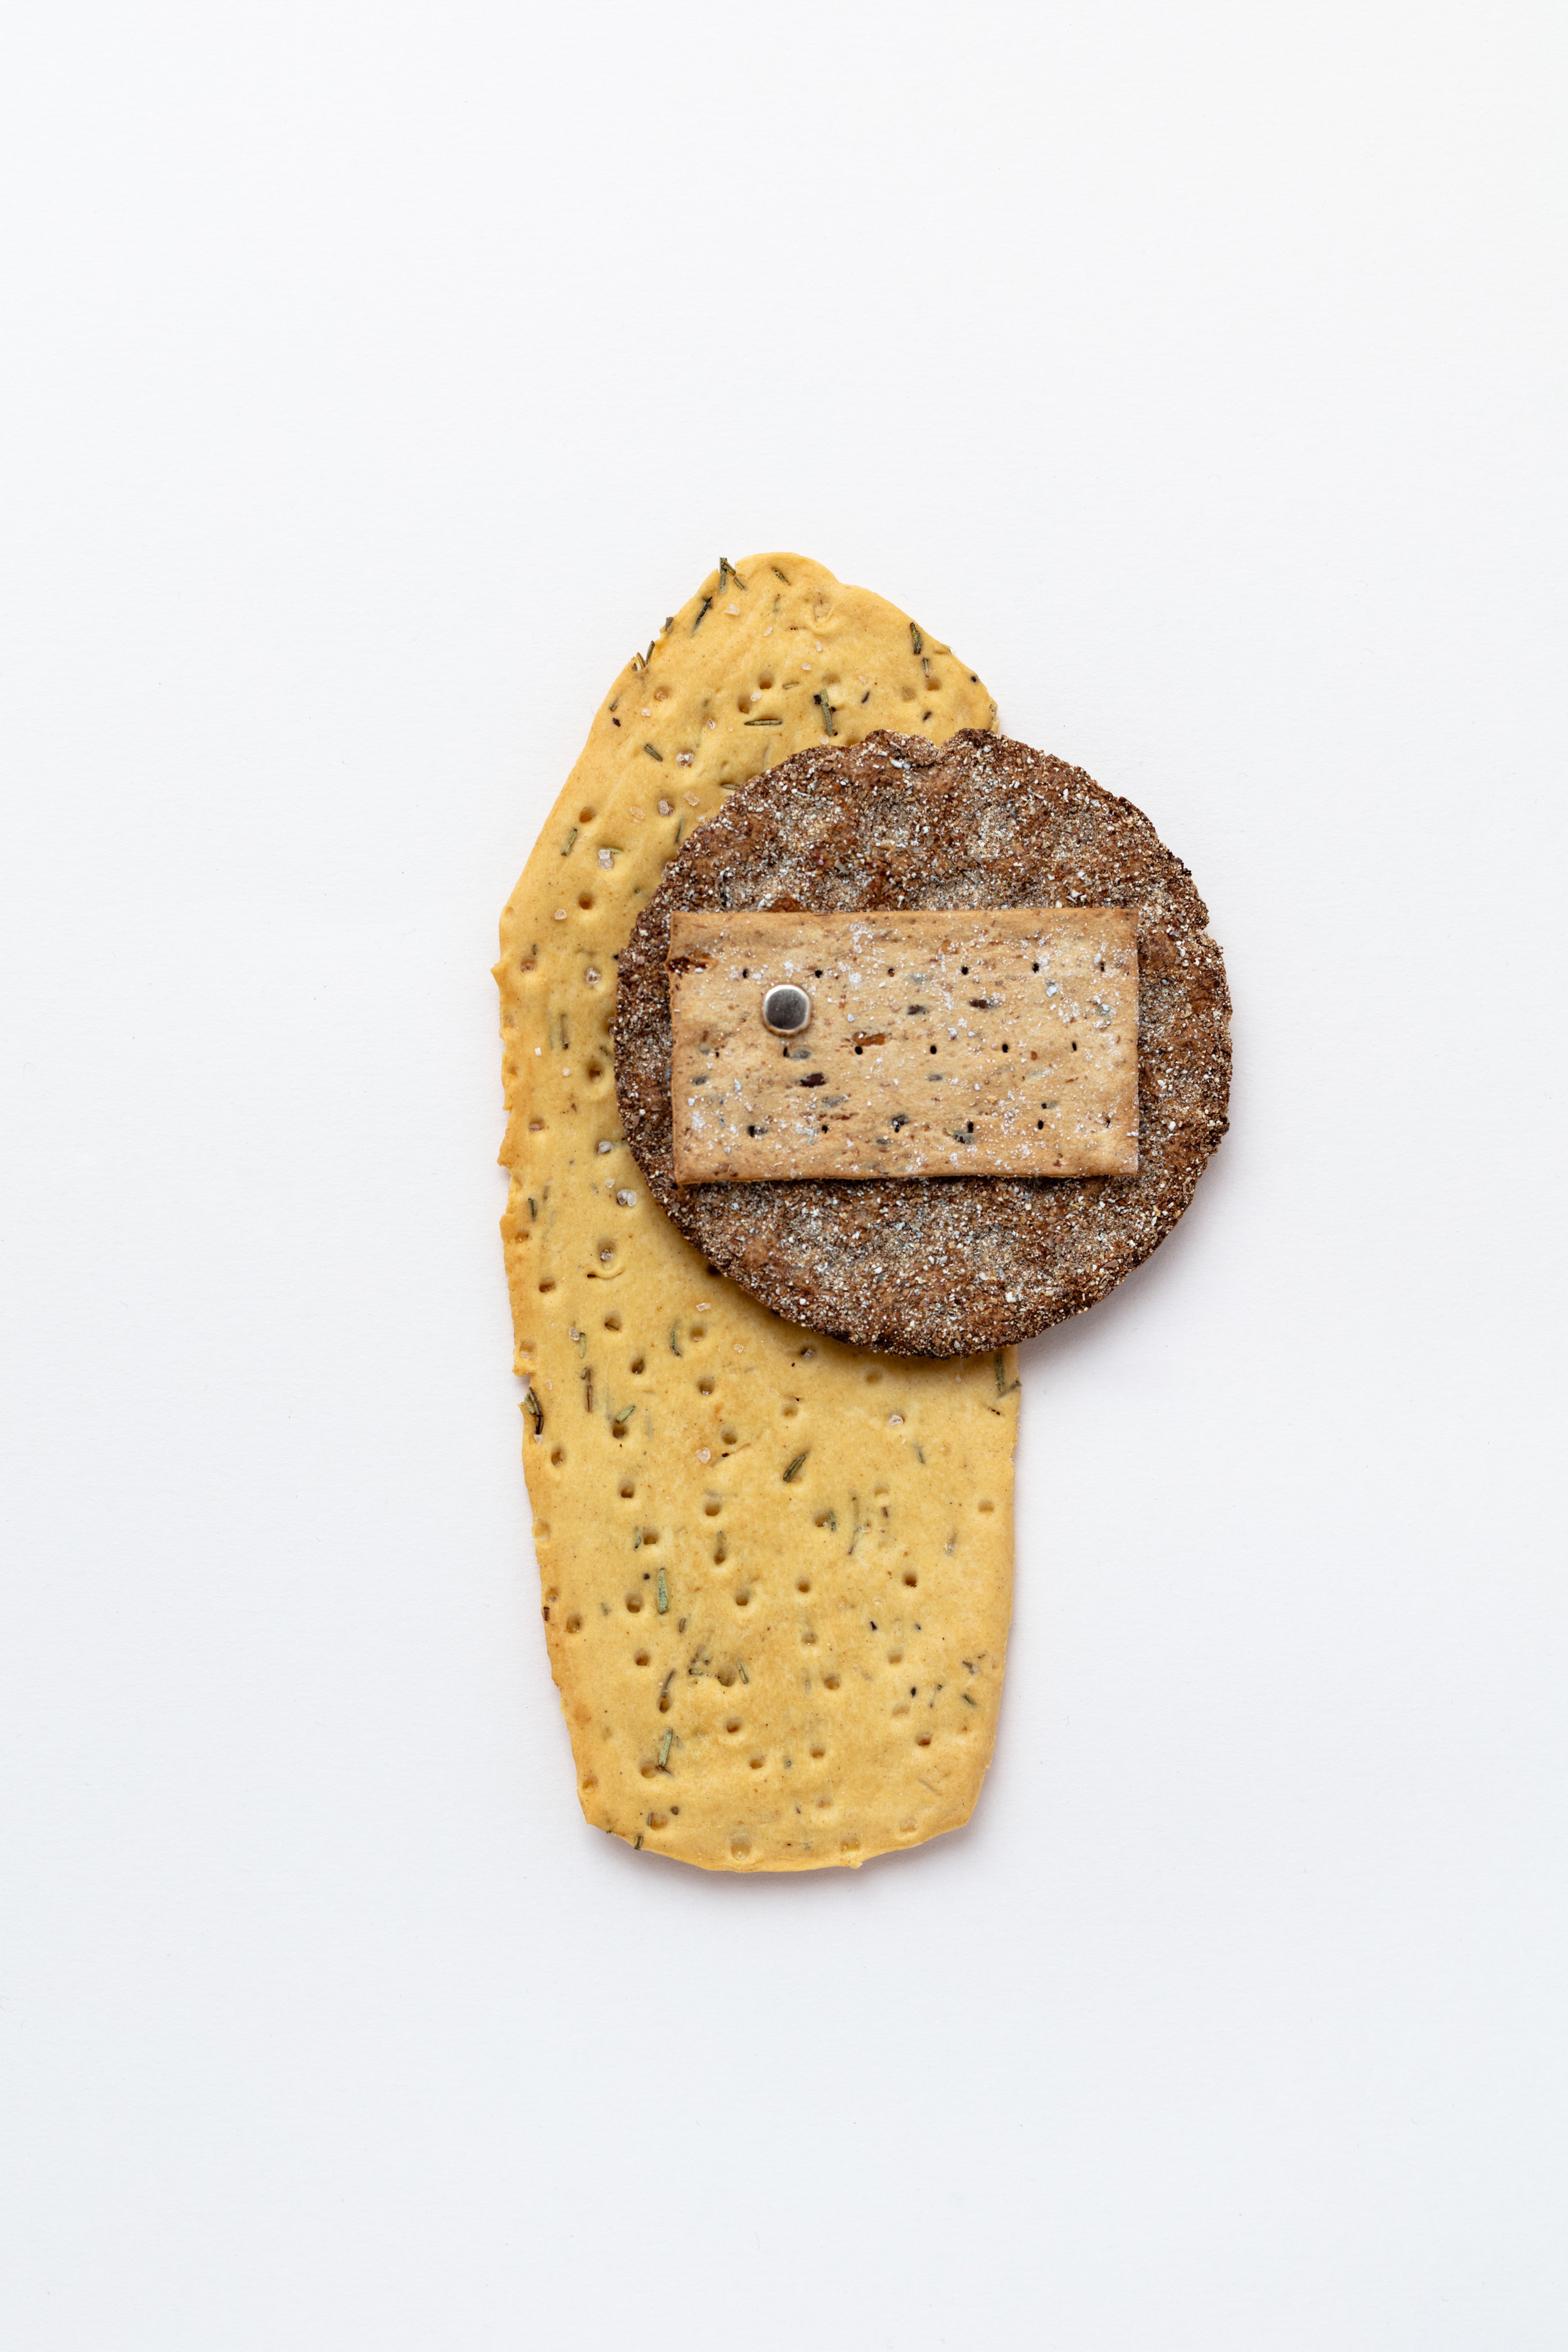 NP-CW-Cheese15.jpg